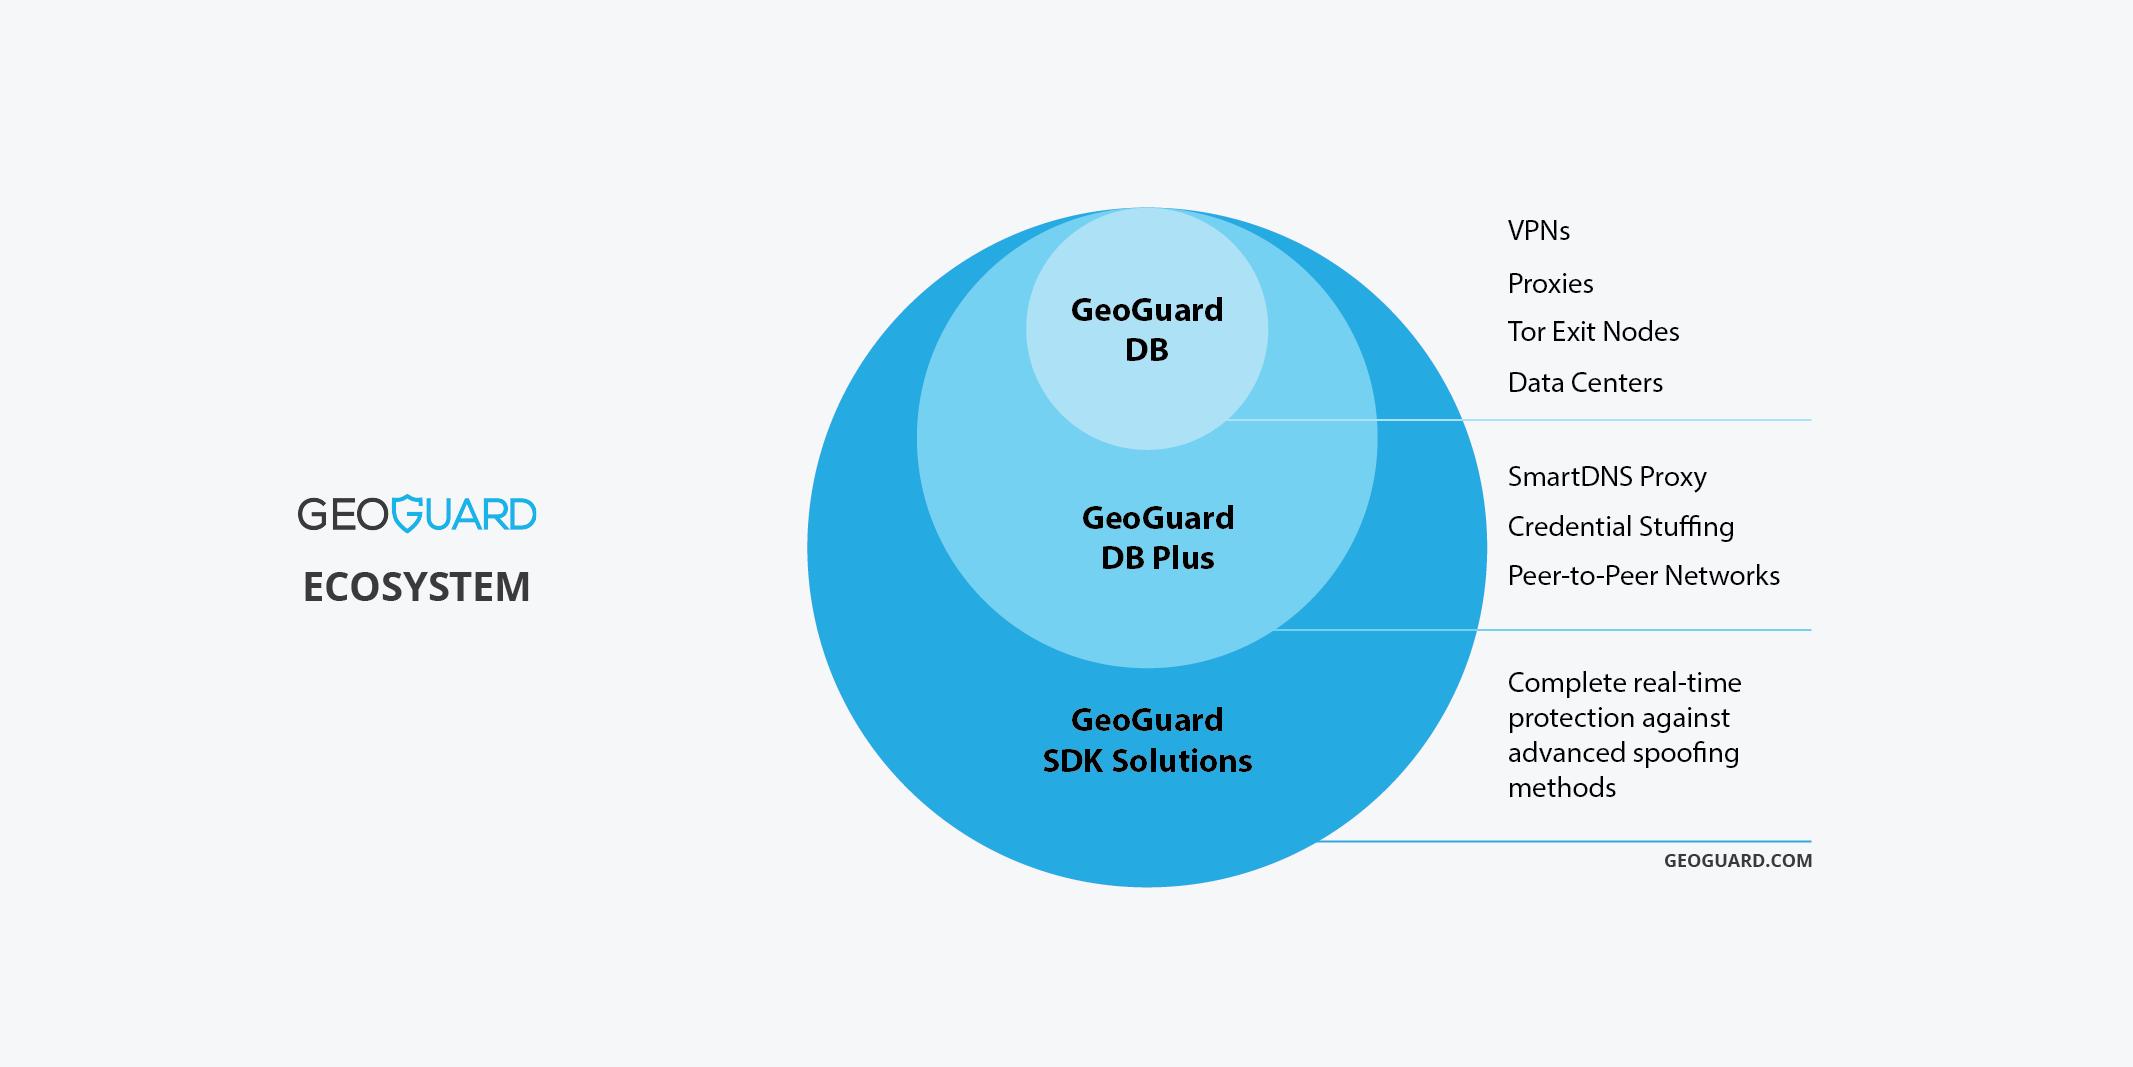 GeoGuard-Ecosystem